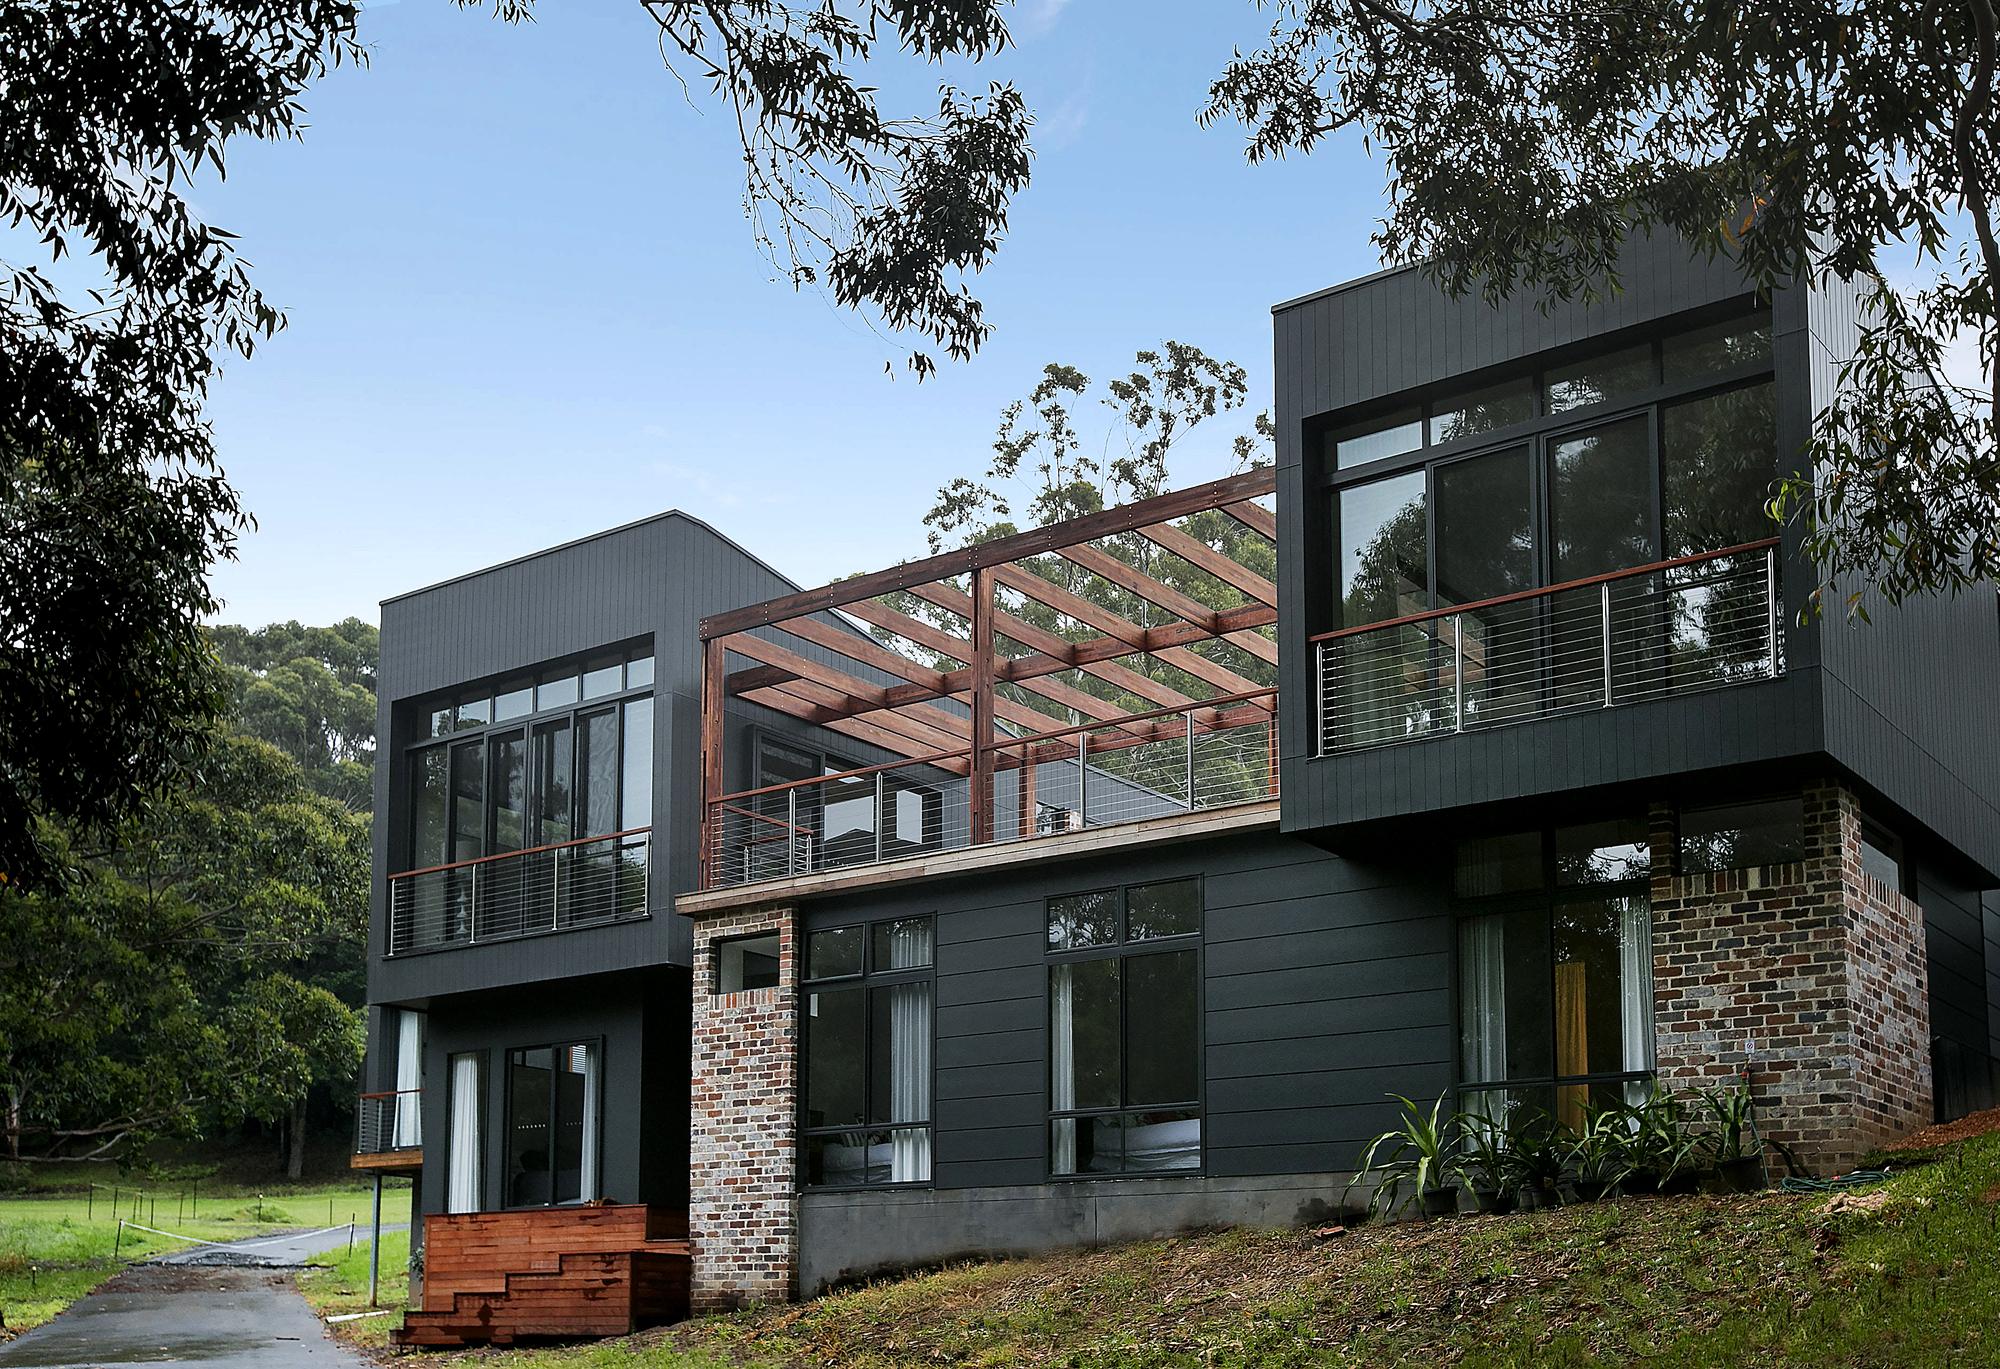 Gallery of pavilion house alex urena design studio 10 for Pavillion home designs australia